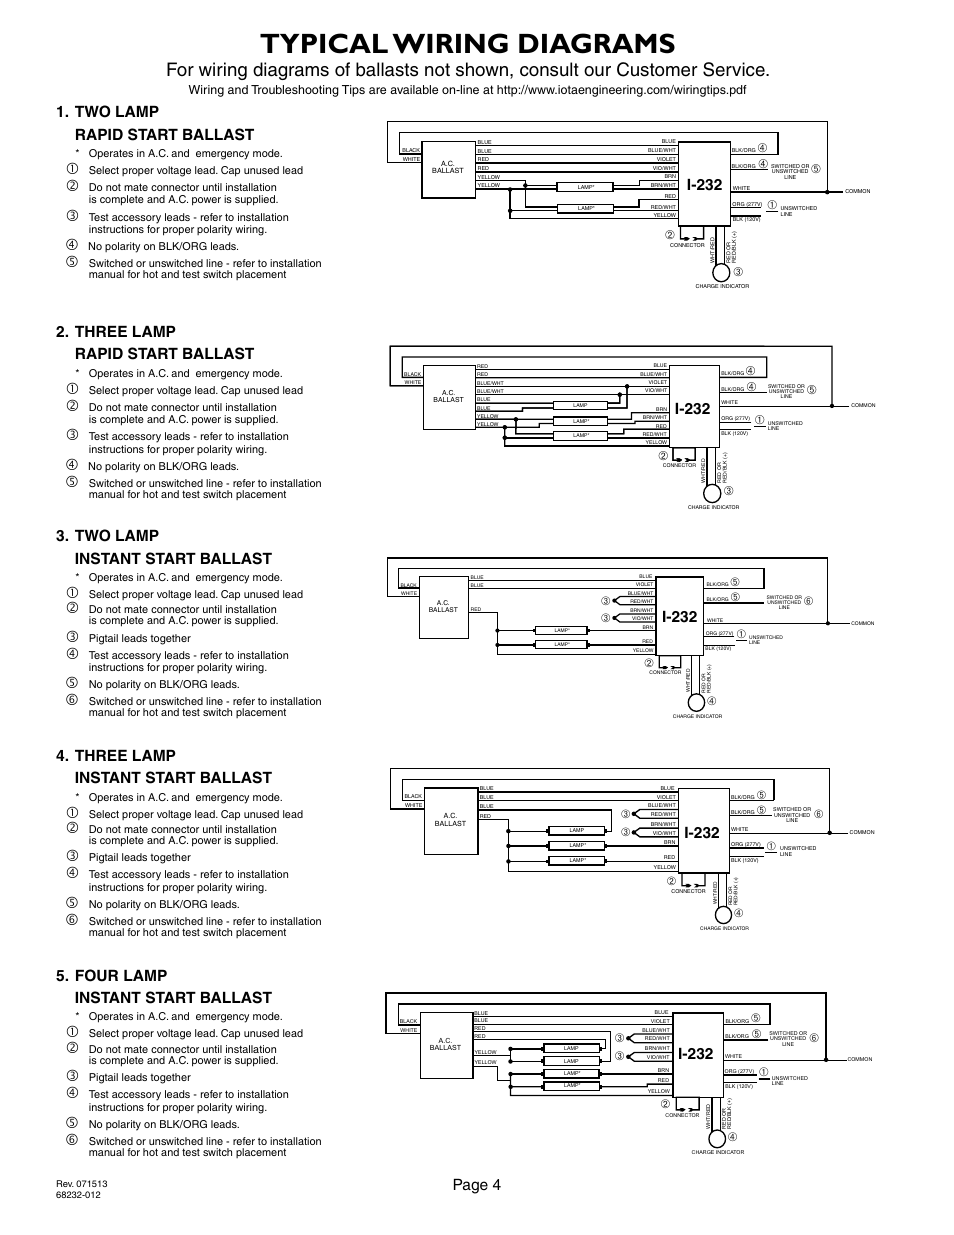 iota i 232 page4?resize\=840%2C1087 iota i42 wiring diagrams wiring diagrams iota isd-80 wiring diagram at reclaimingppi.co